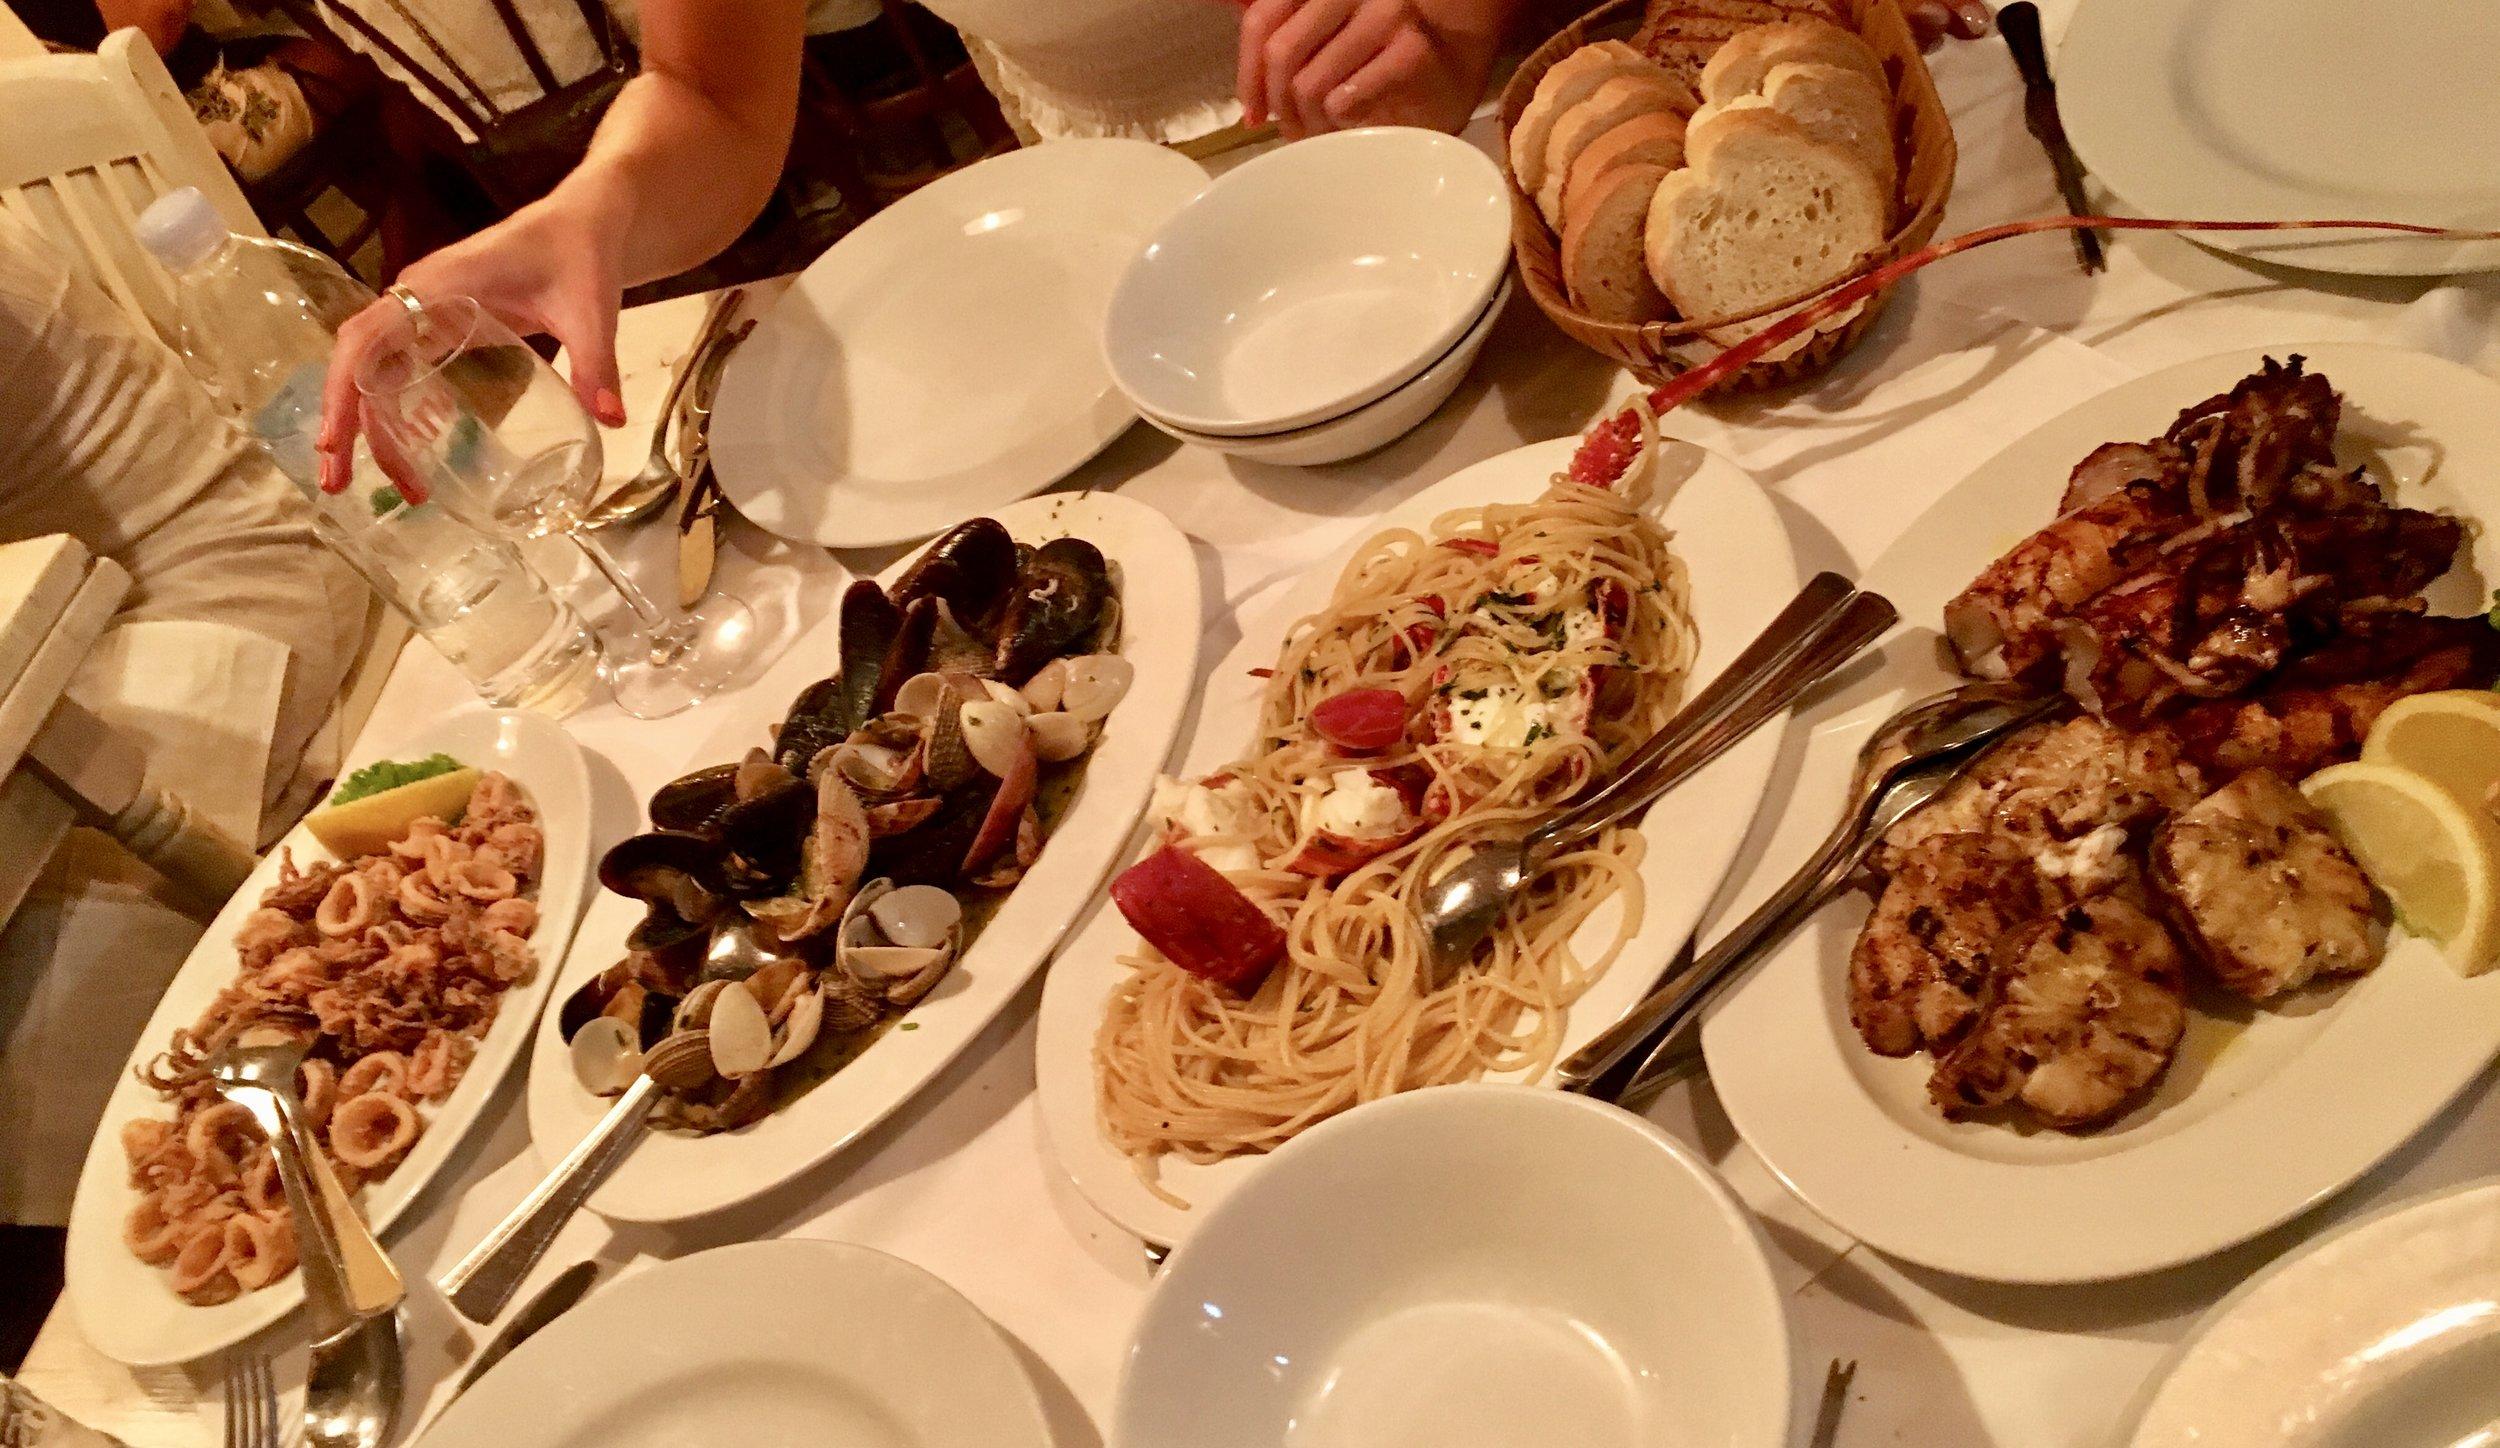 Croatian food at its finest!